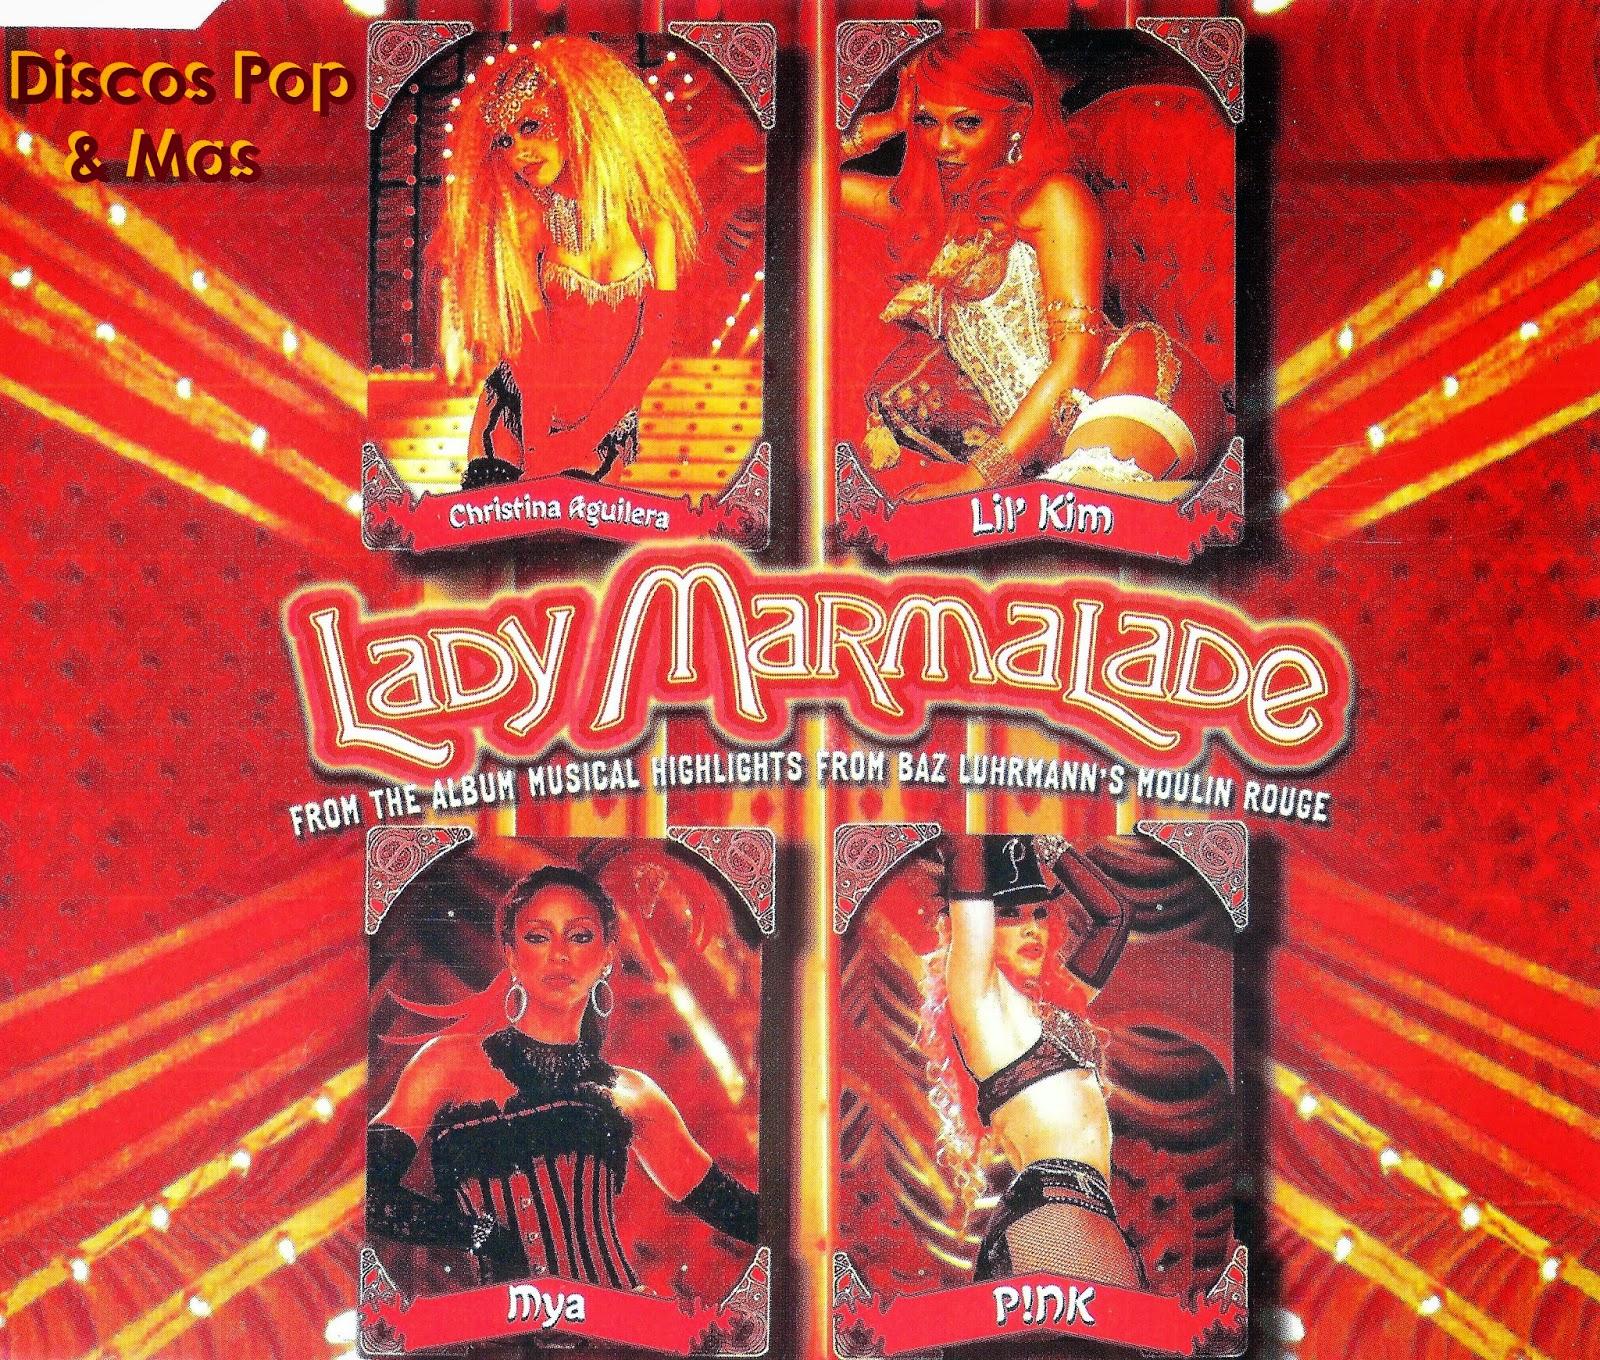 la cancion lady marmalade: